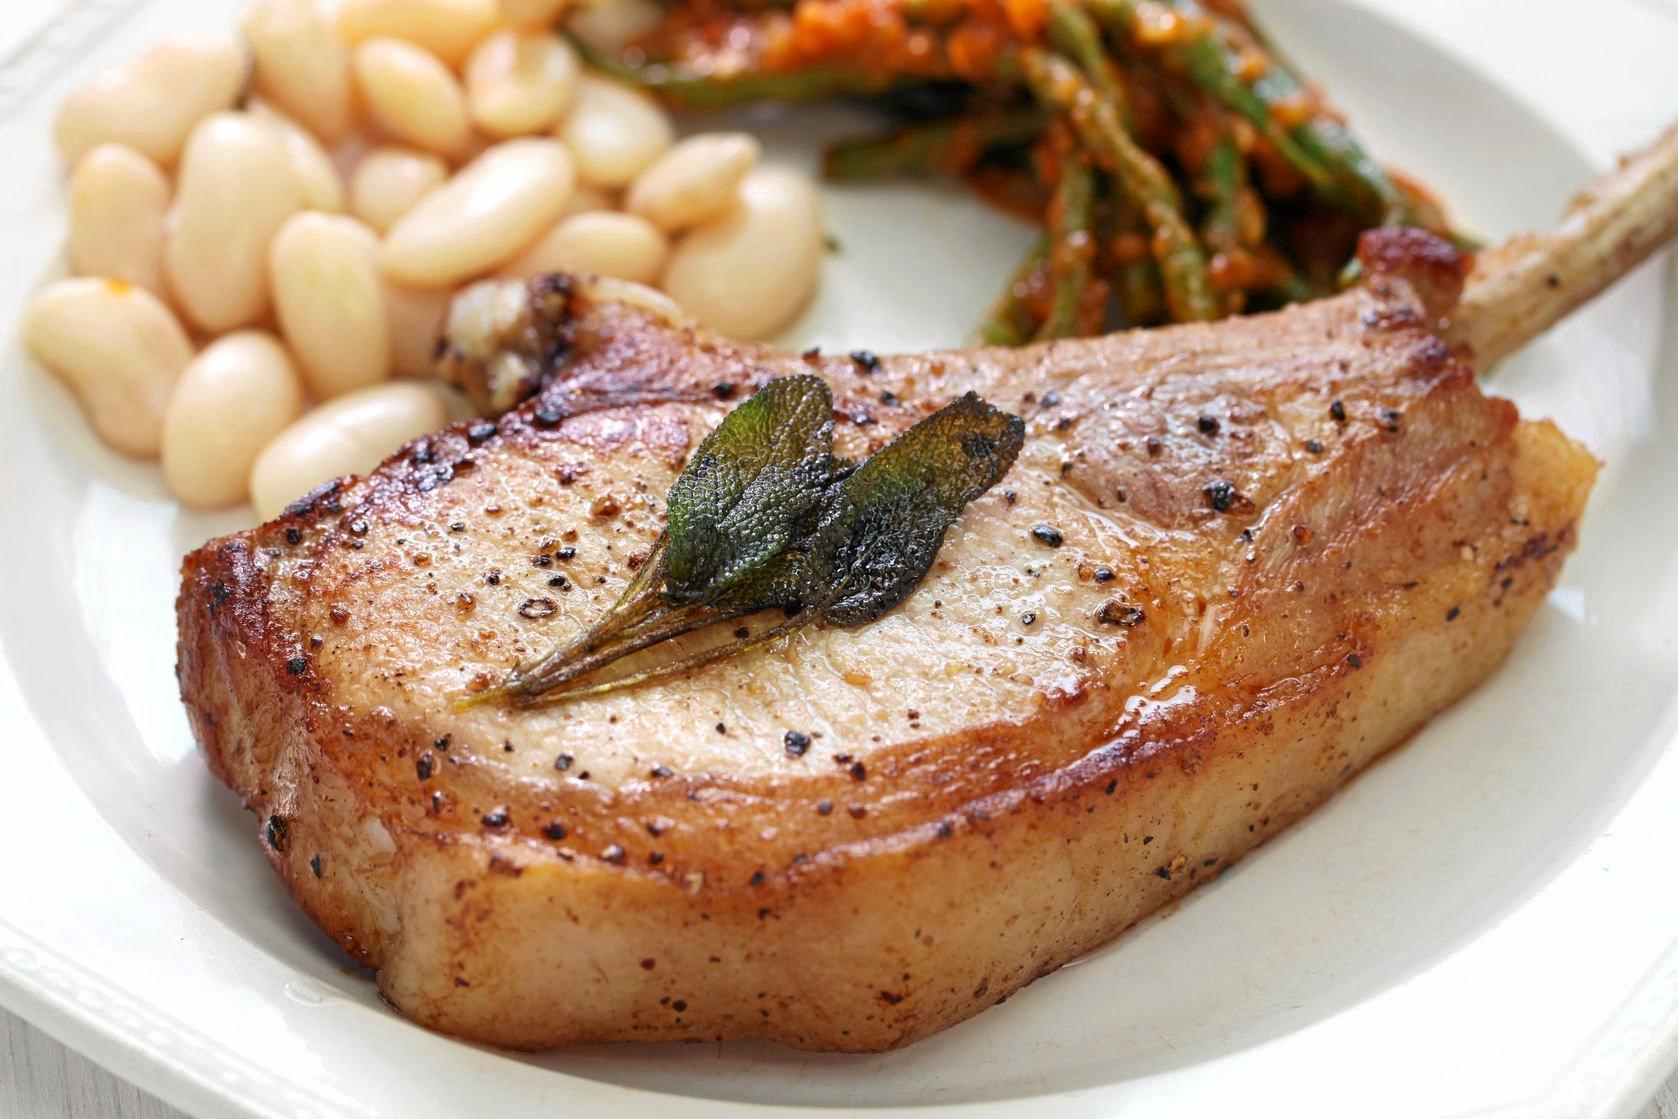 Pork chop or